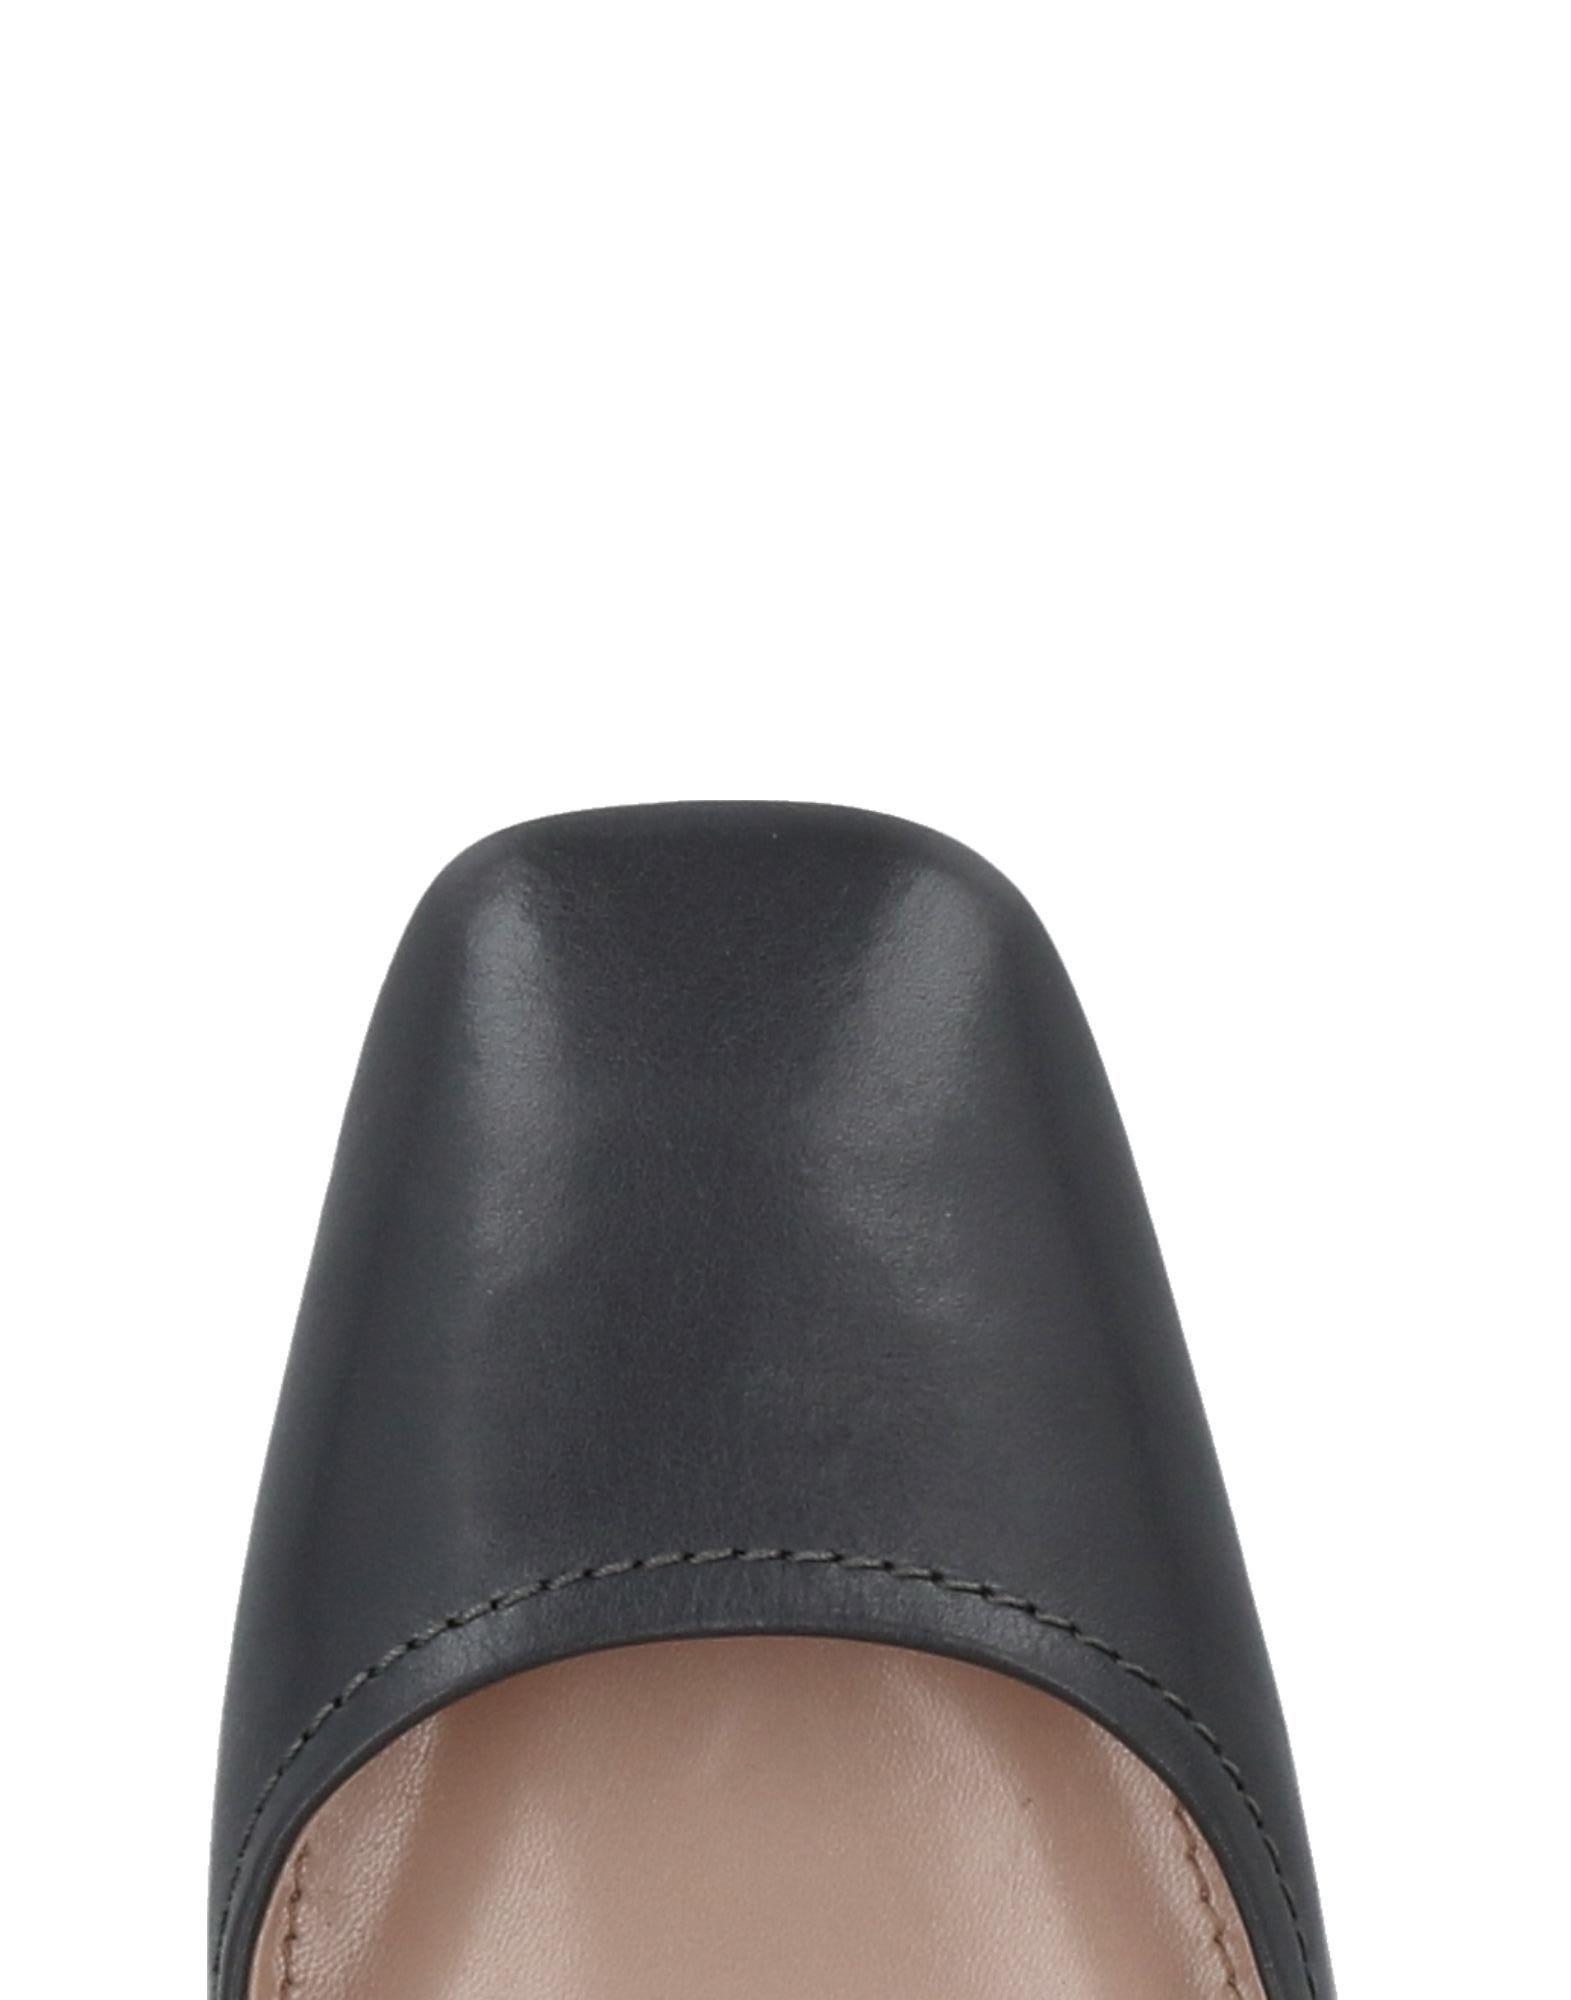 Cavallini Pumps Damen Qualität  11454399DU Gute Qualität Damen beliebte Schuhe a09142